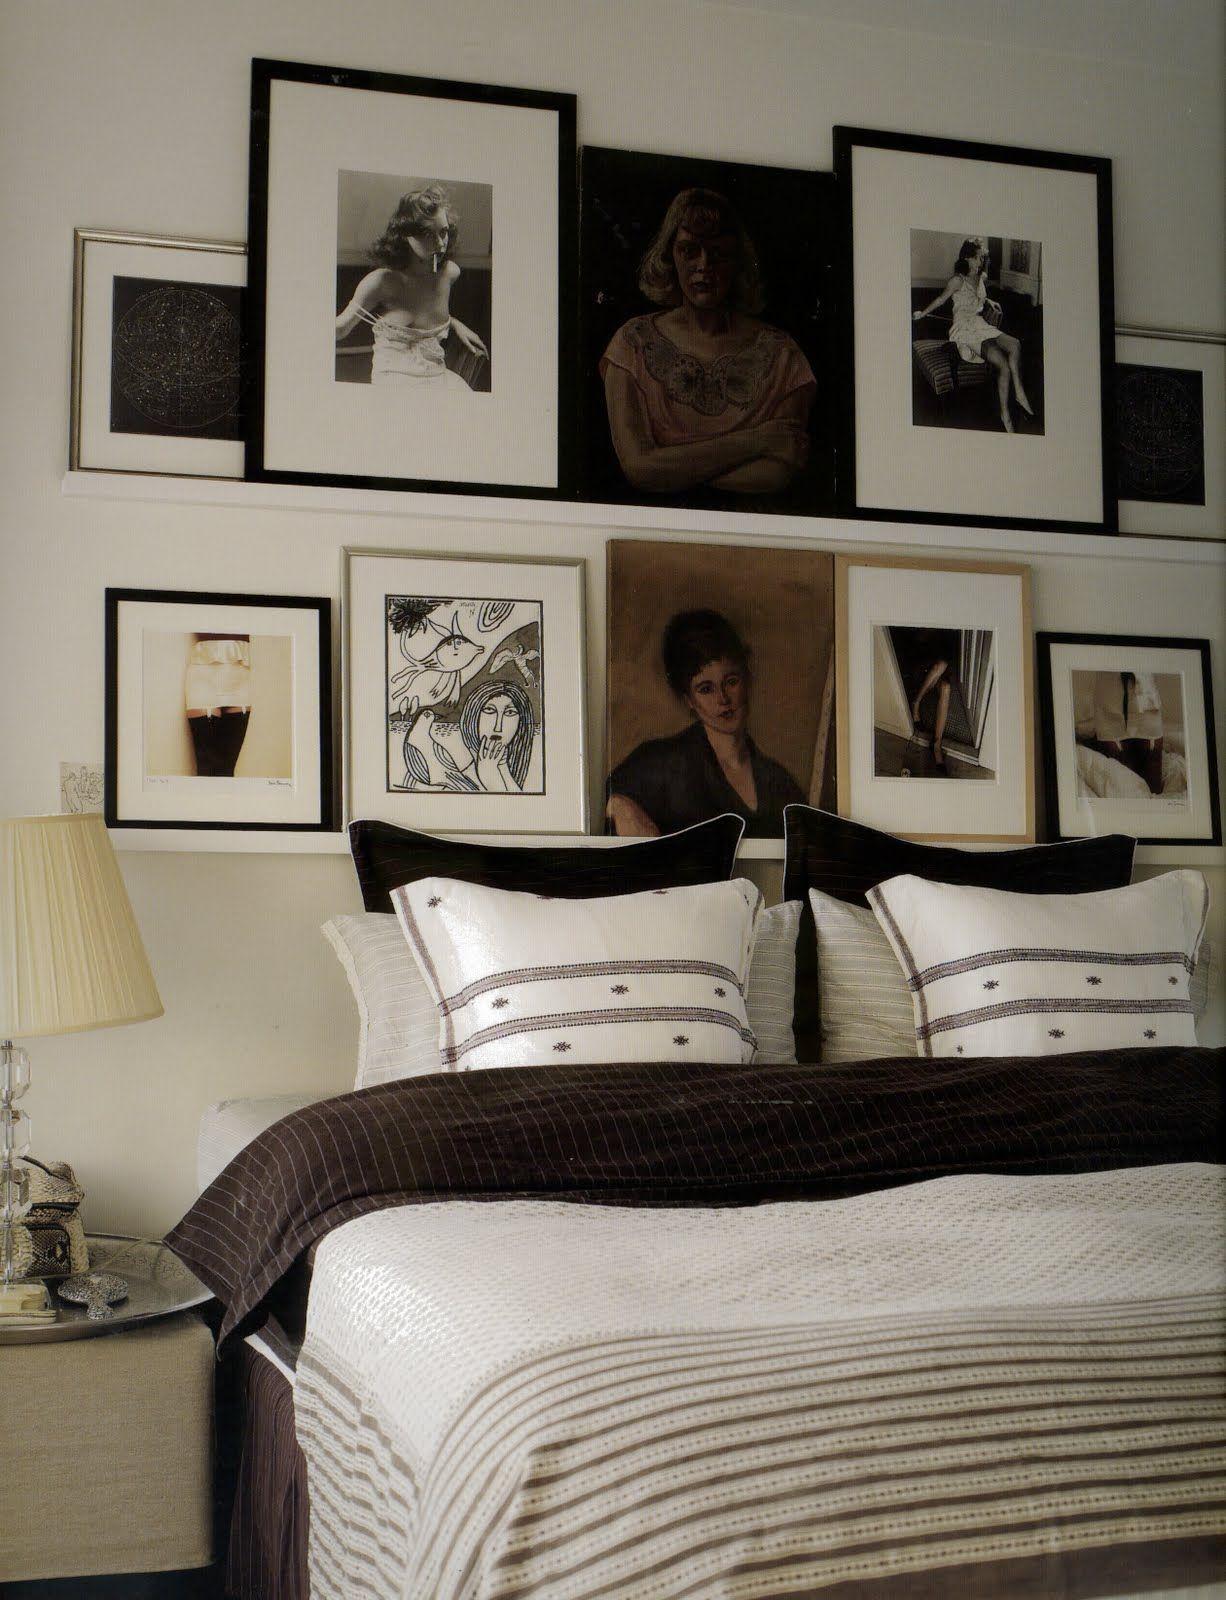 Home of designer Malene Birger | Interiores | Pinterest | Cuadro ...